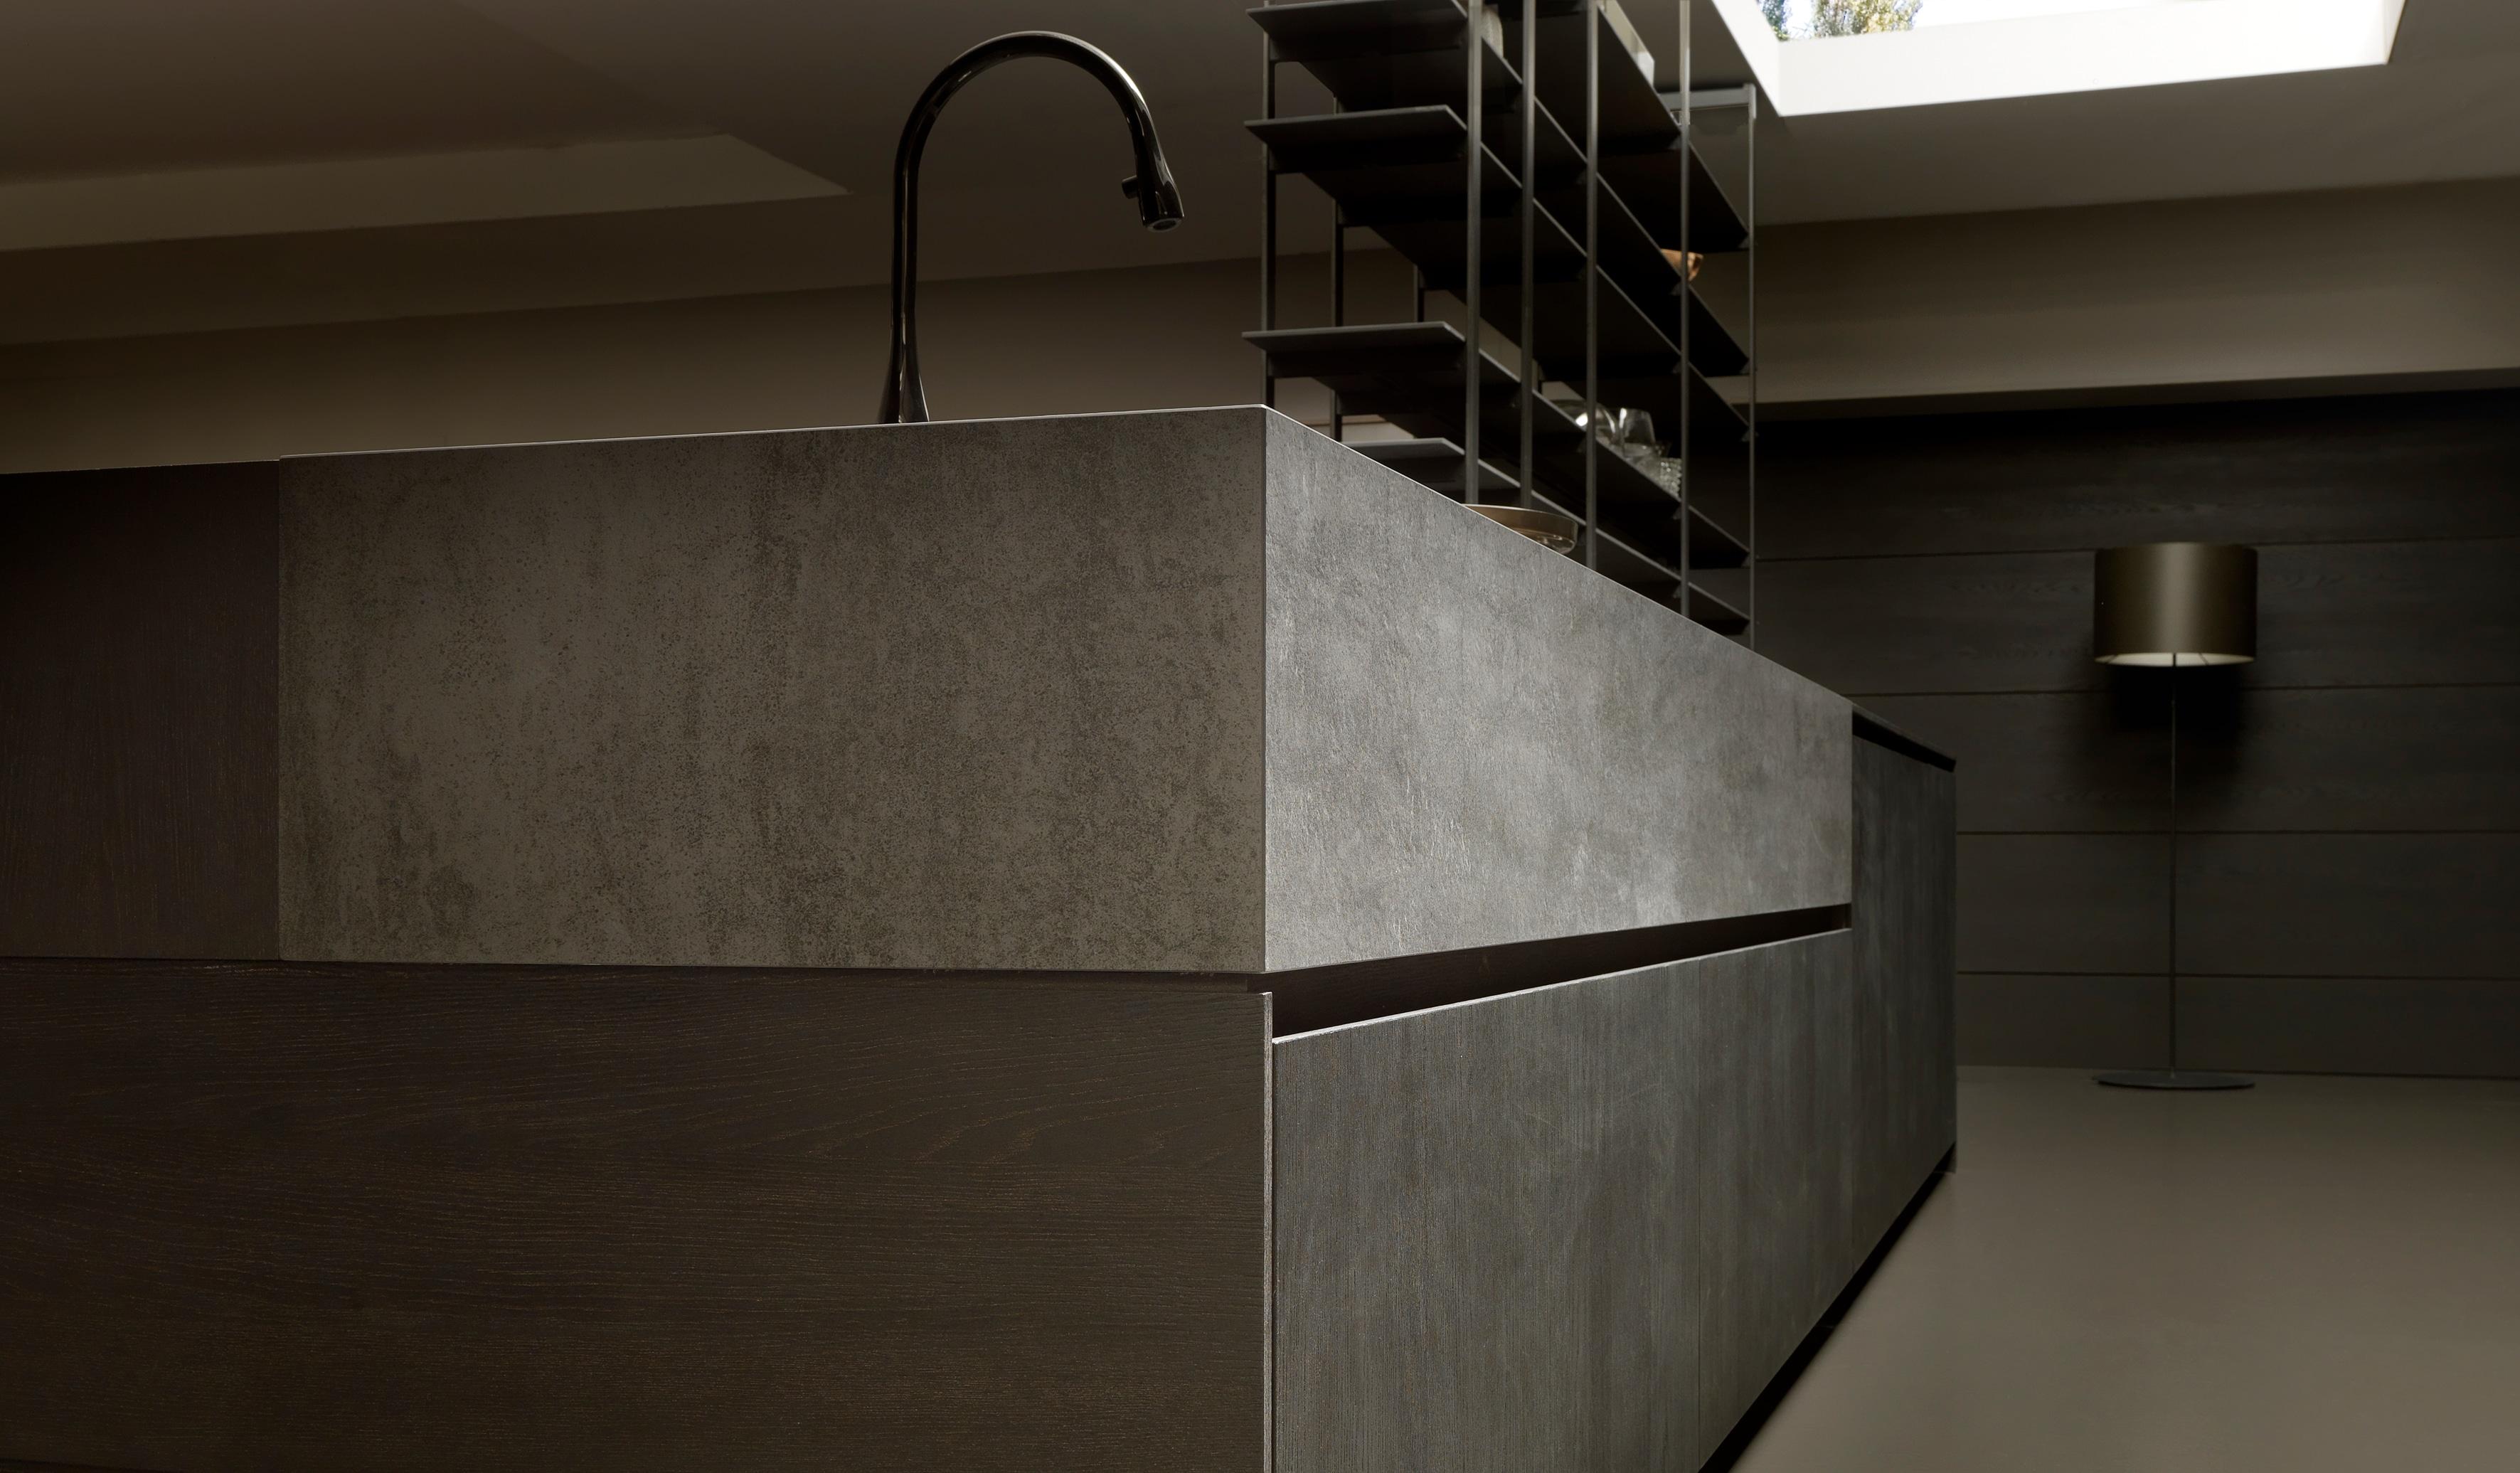 The design revolution in the kitchen - Interni Magazine